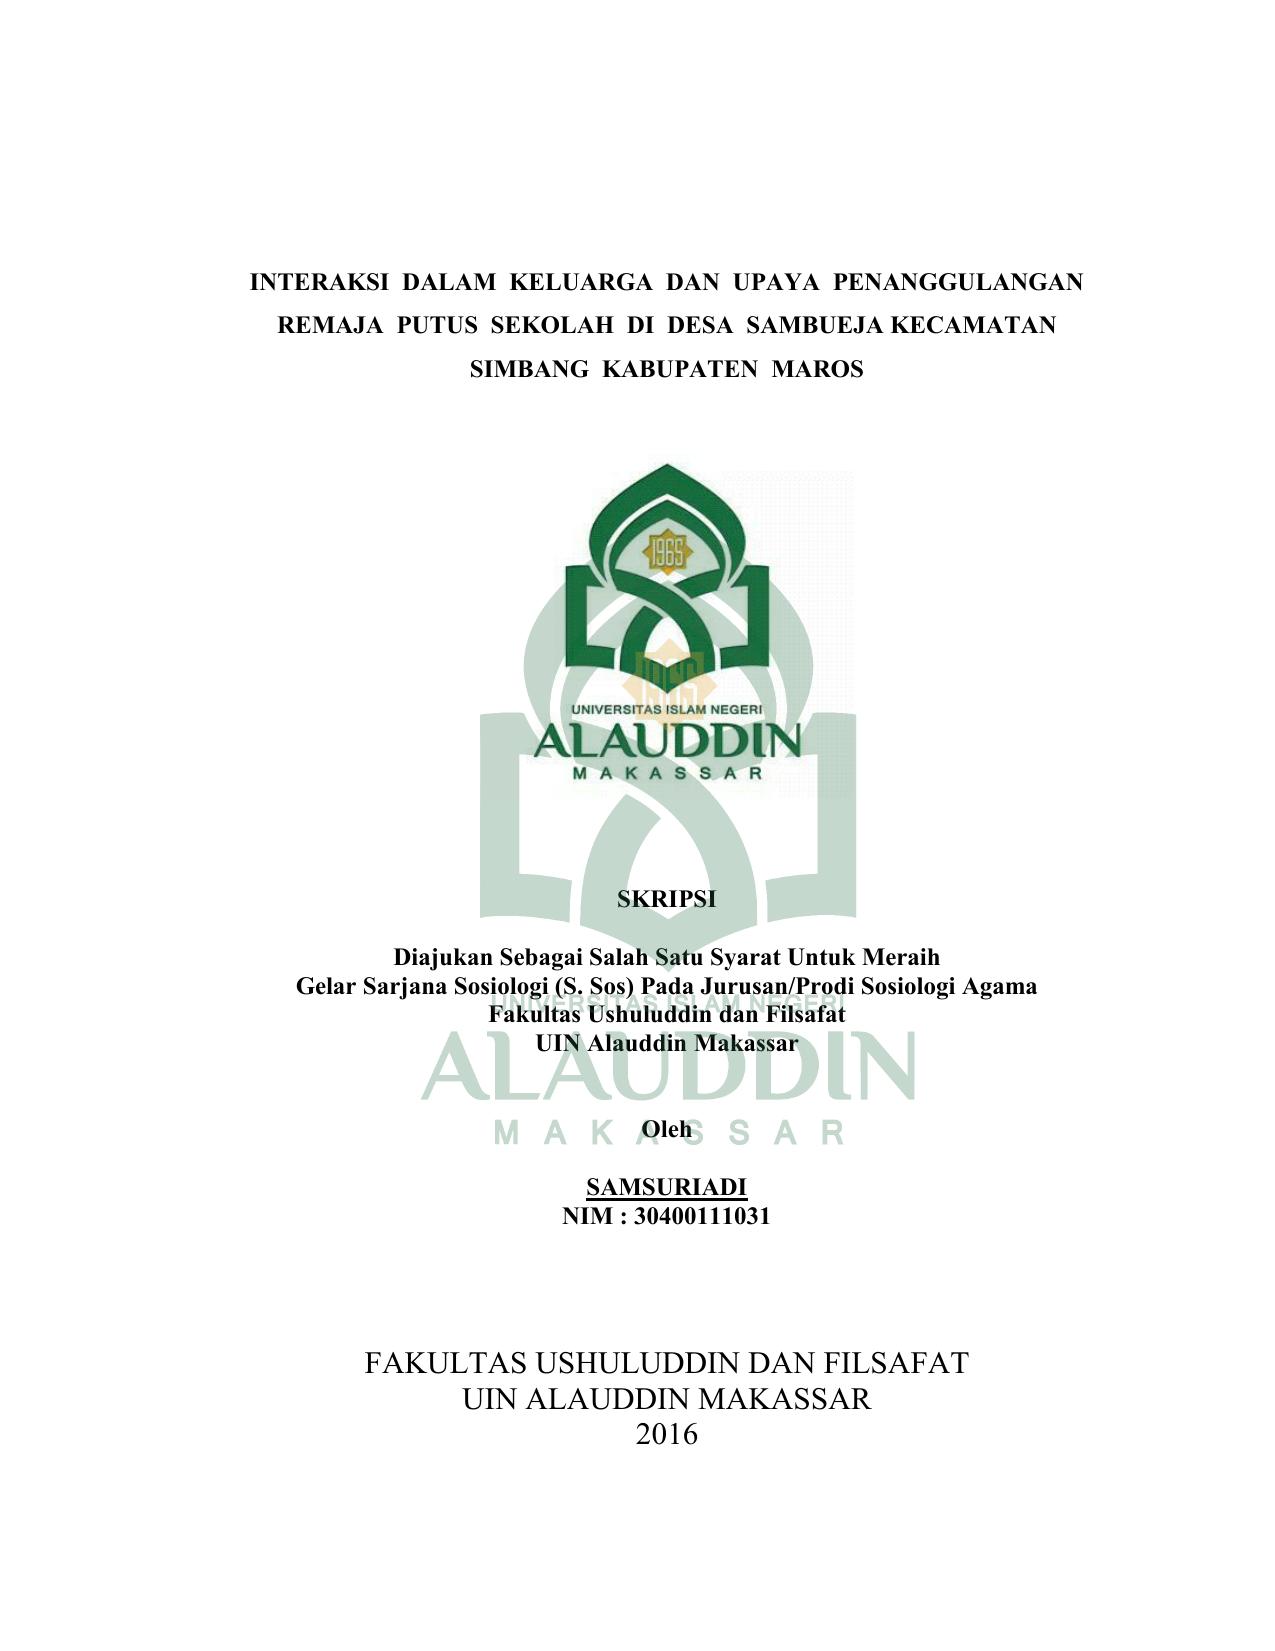 Fakultas Ushuluddin Dan Filsafat Uin Alauddin Makassar 2016